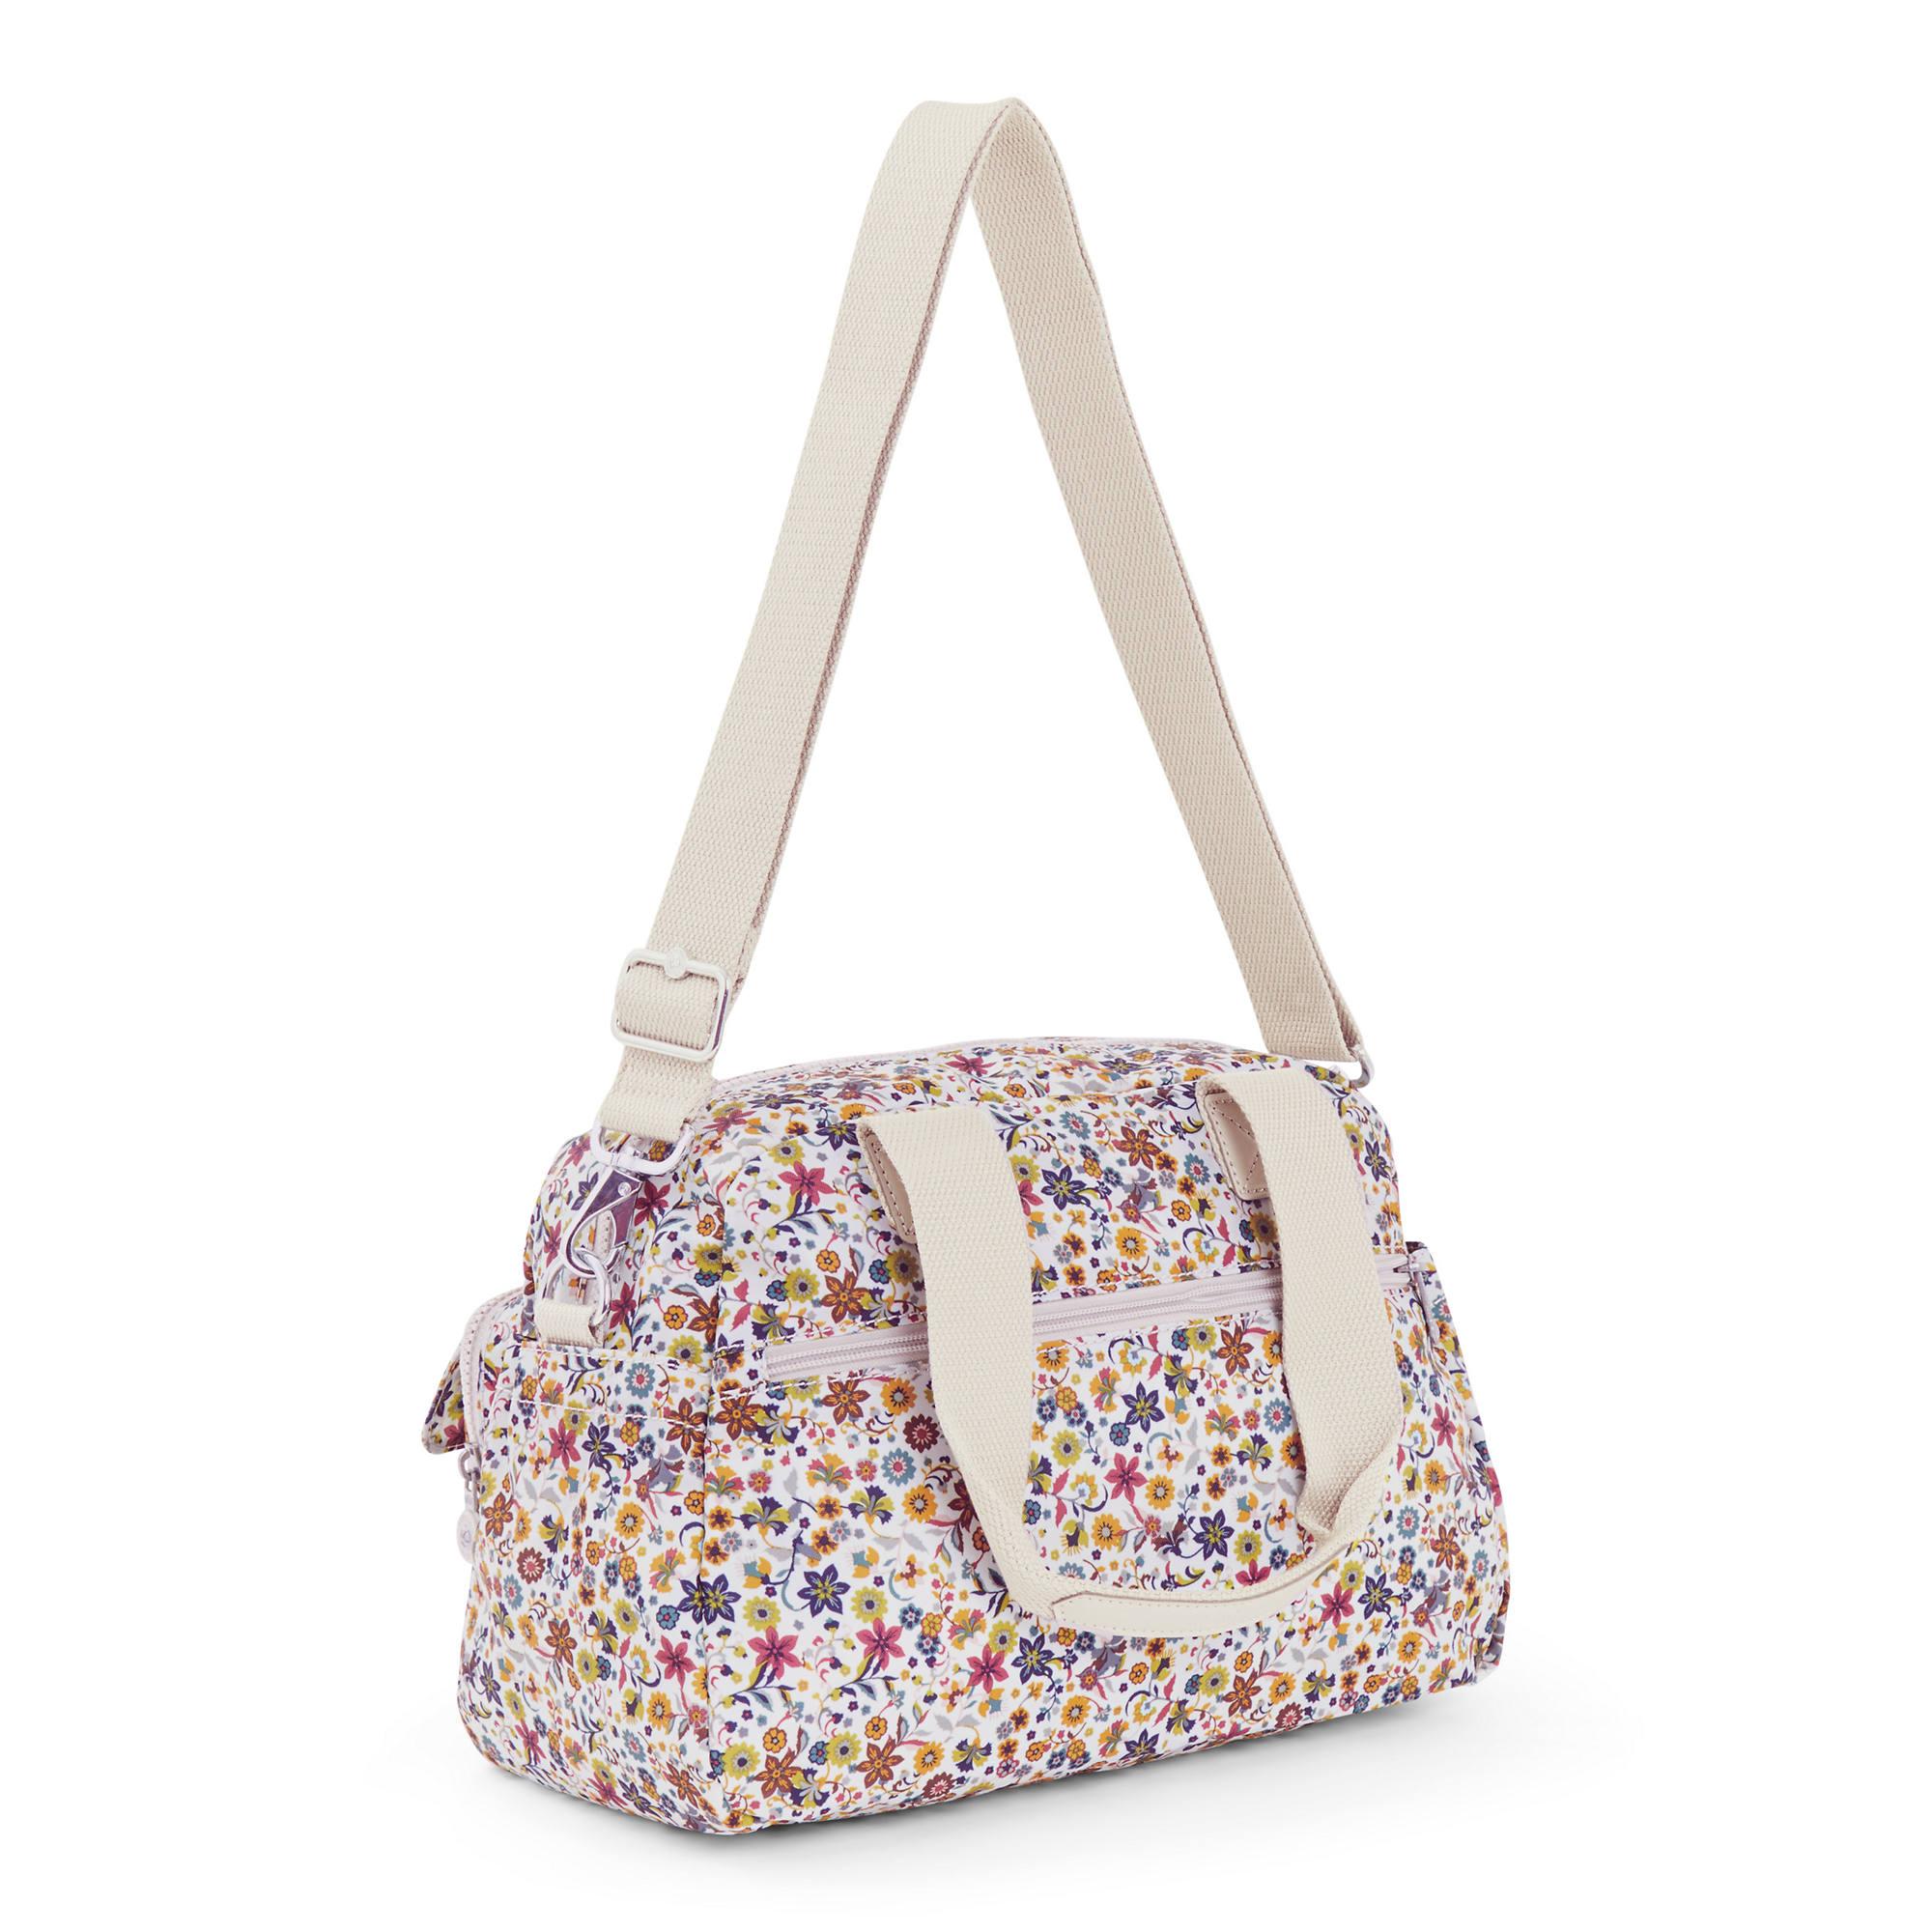 Defea Printed Handbag Kipling